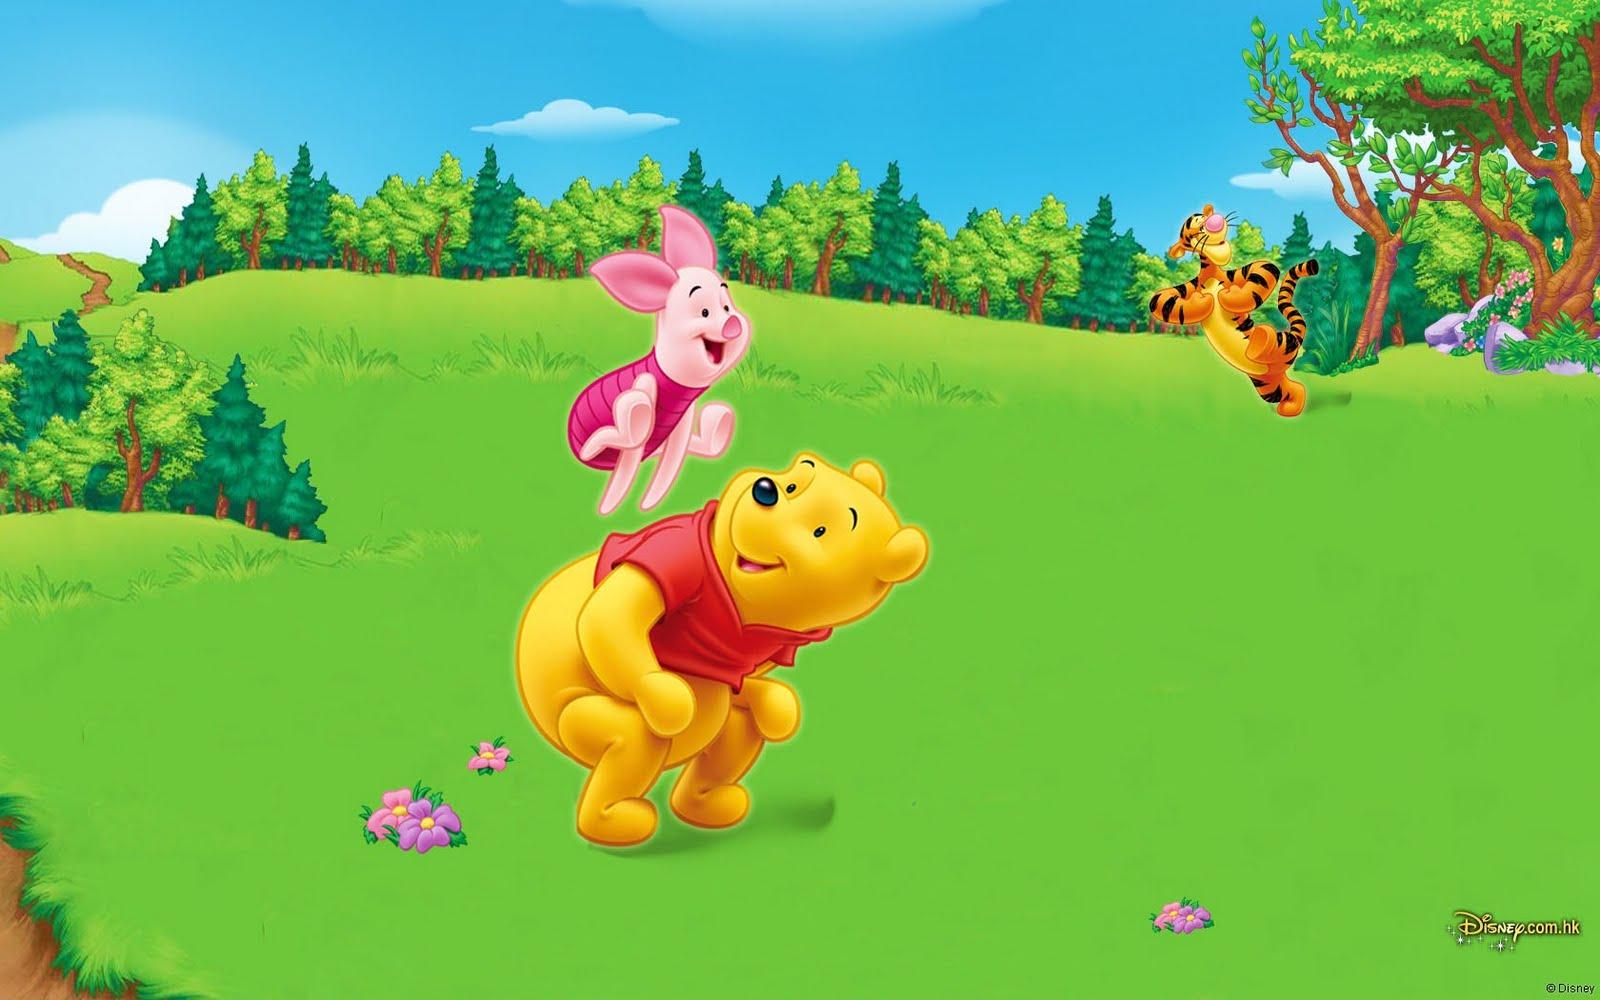 Wallpaper Winnie The Pooh: Wallpapers Photo Art: Winnie The Pooh Wallpaper, HD Wallpaper